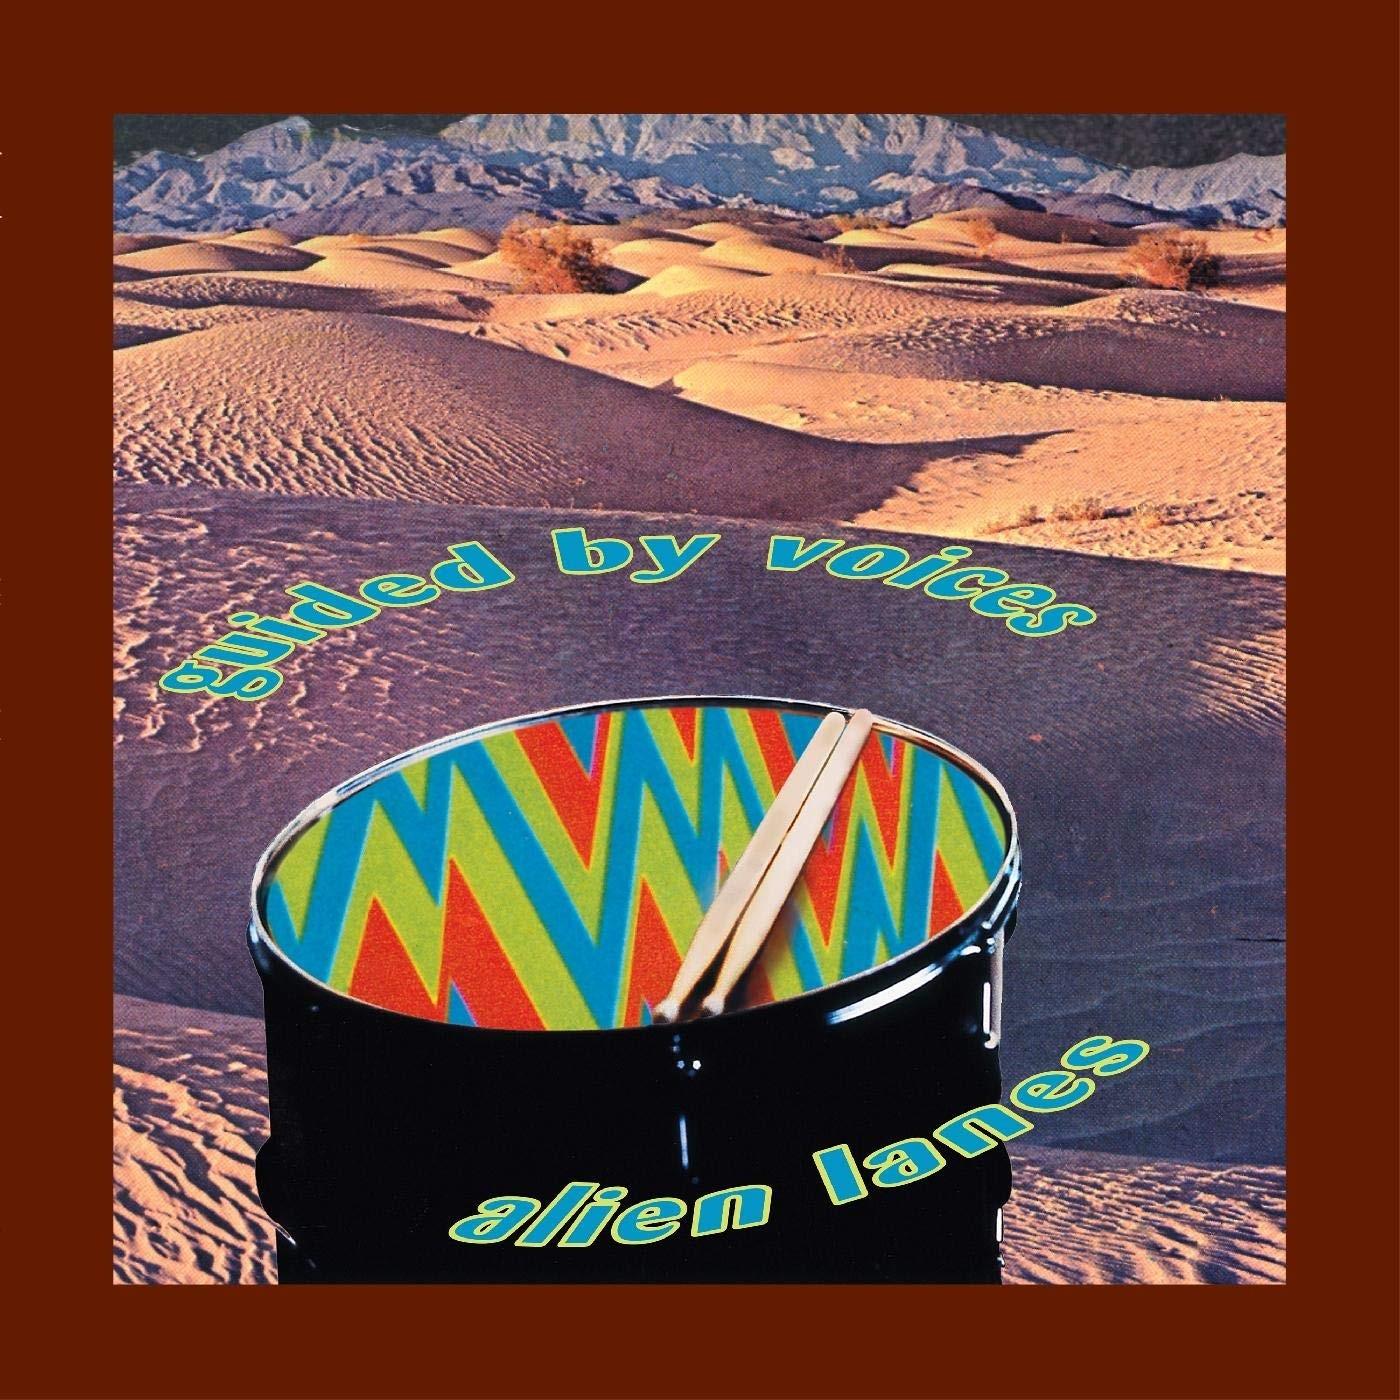 Guided by Voices - Alien Lanes (Multi-Colored) Vinyl LP